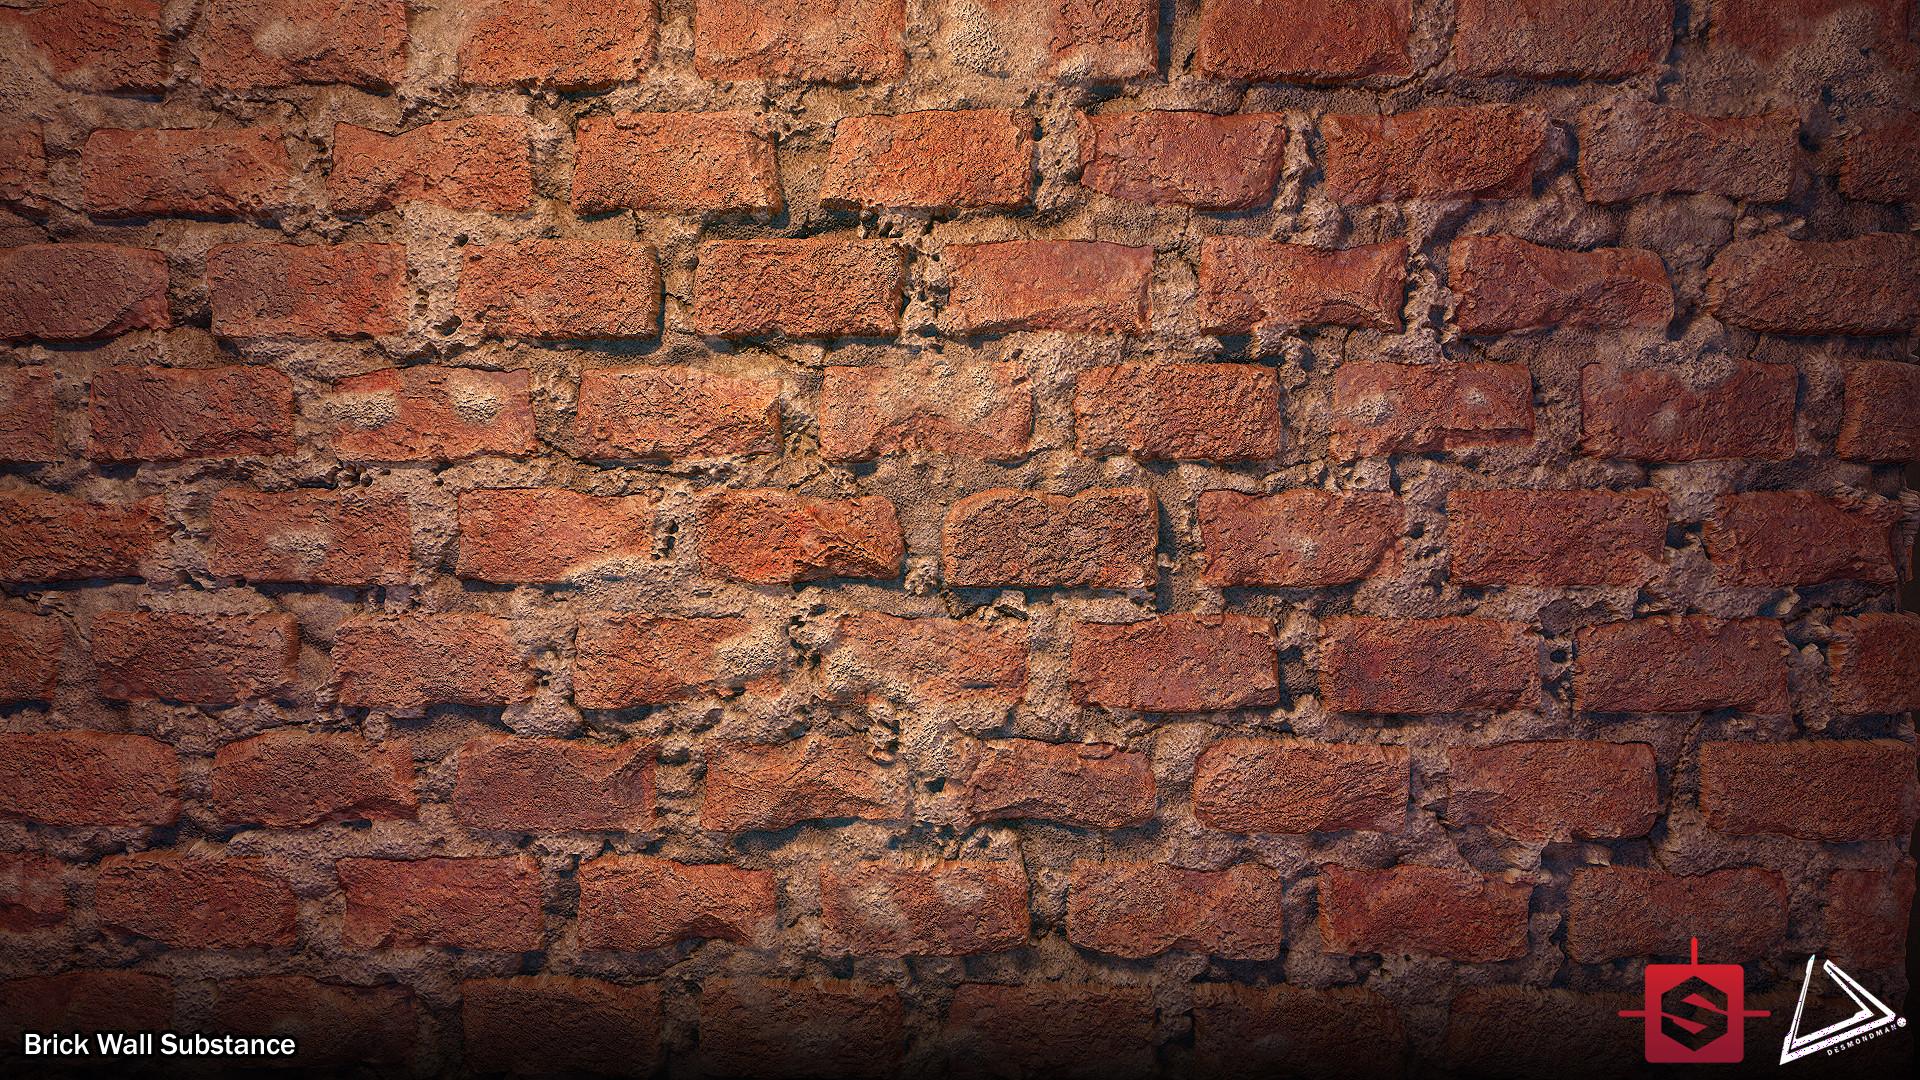 Desmond man sbwc brickwall01 showcase04